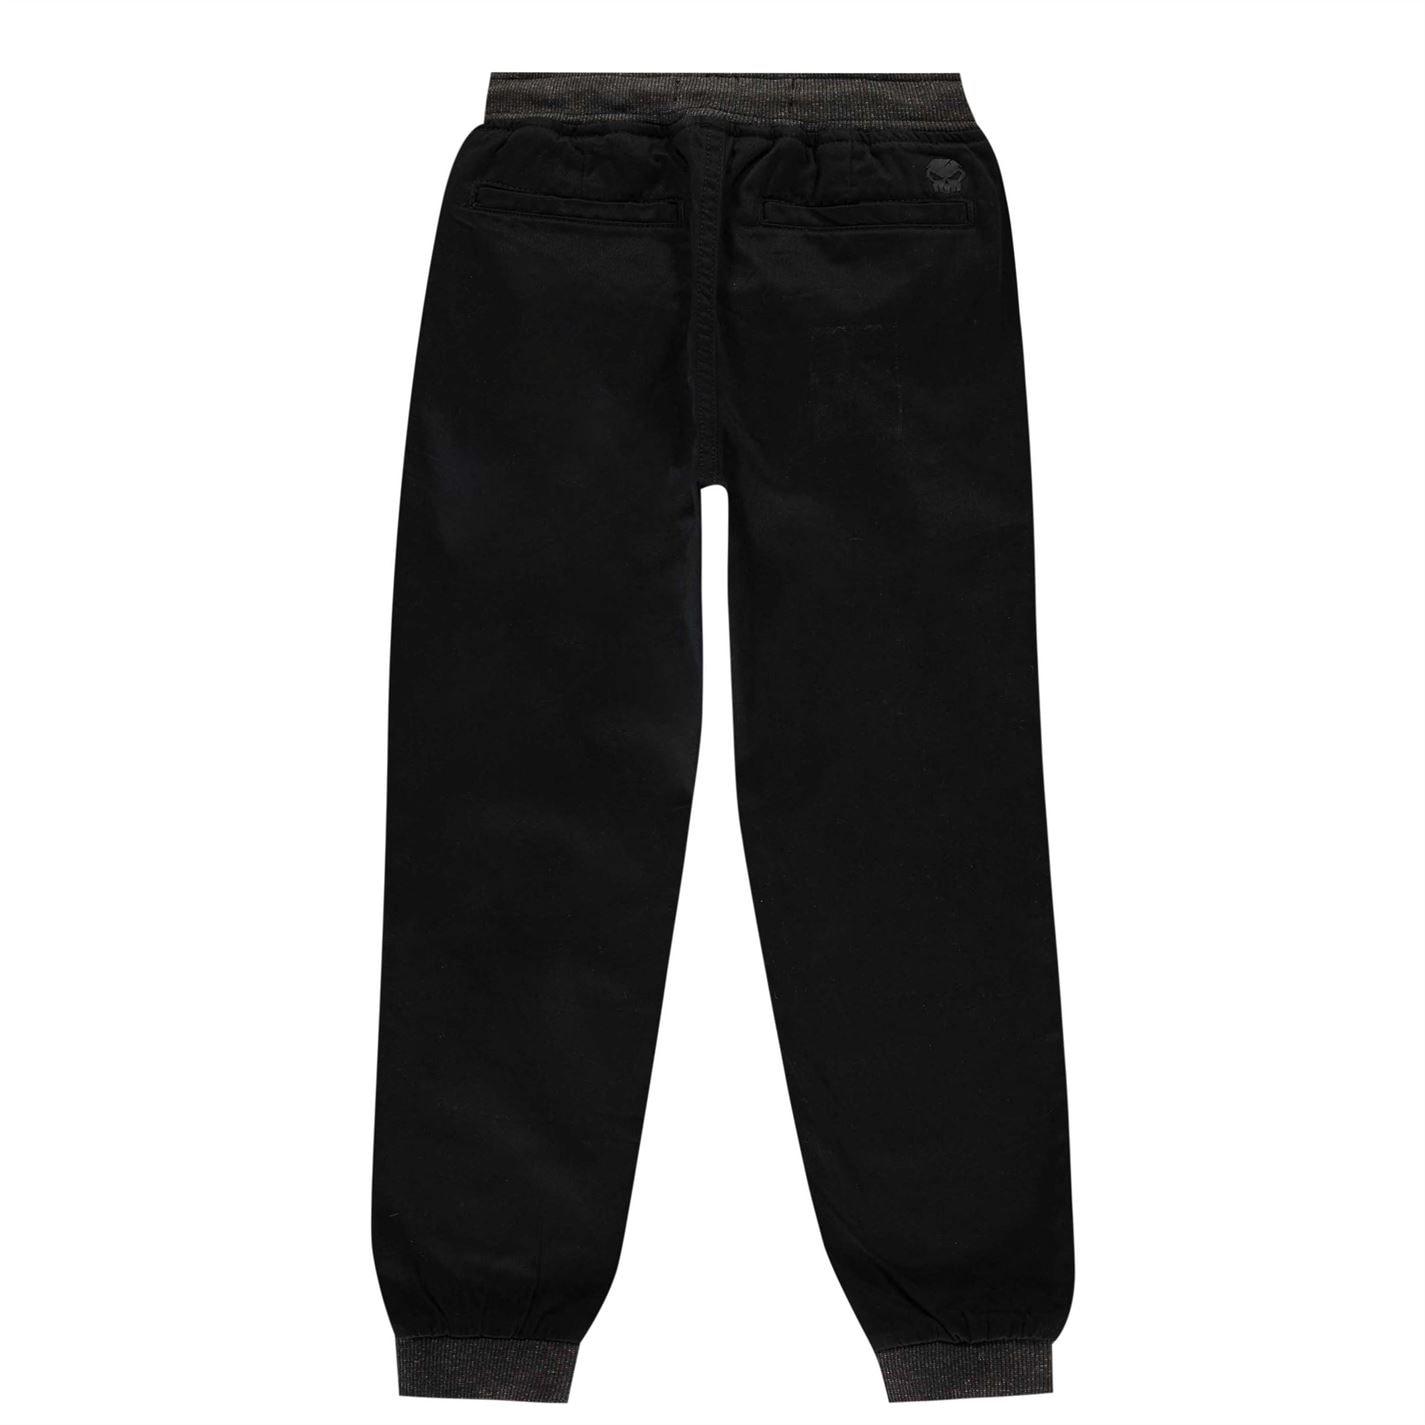 Pantaloni chino No Fear Ribbed Waistband pentru baietei verde negru